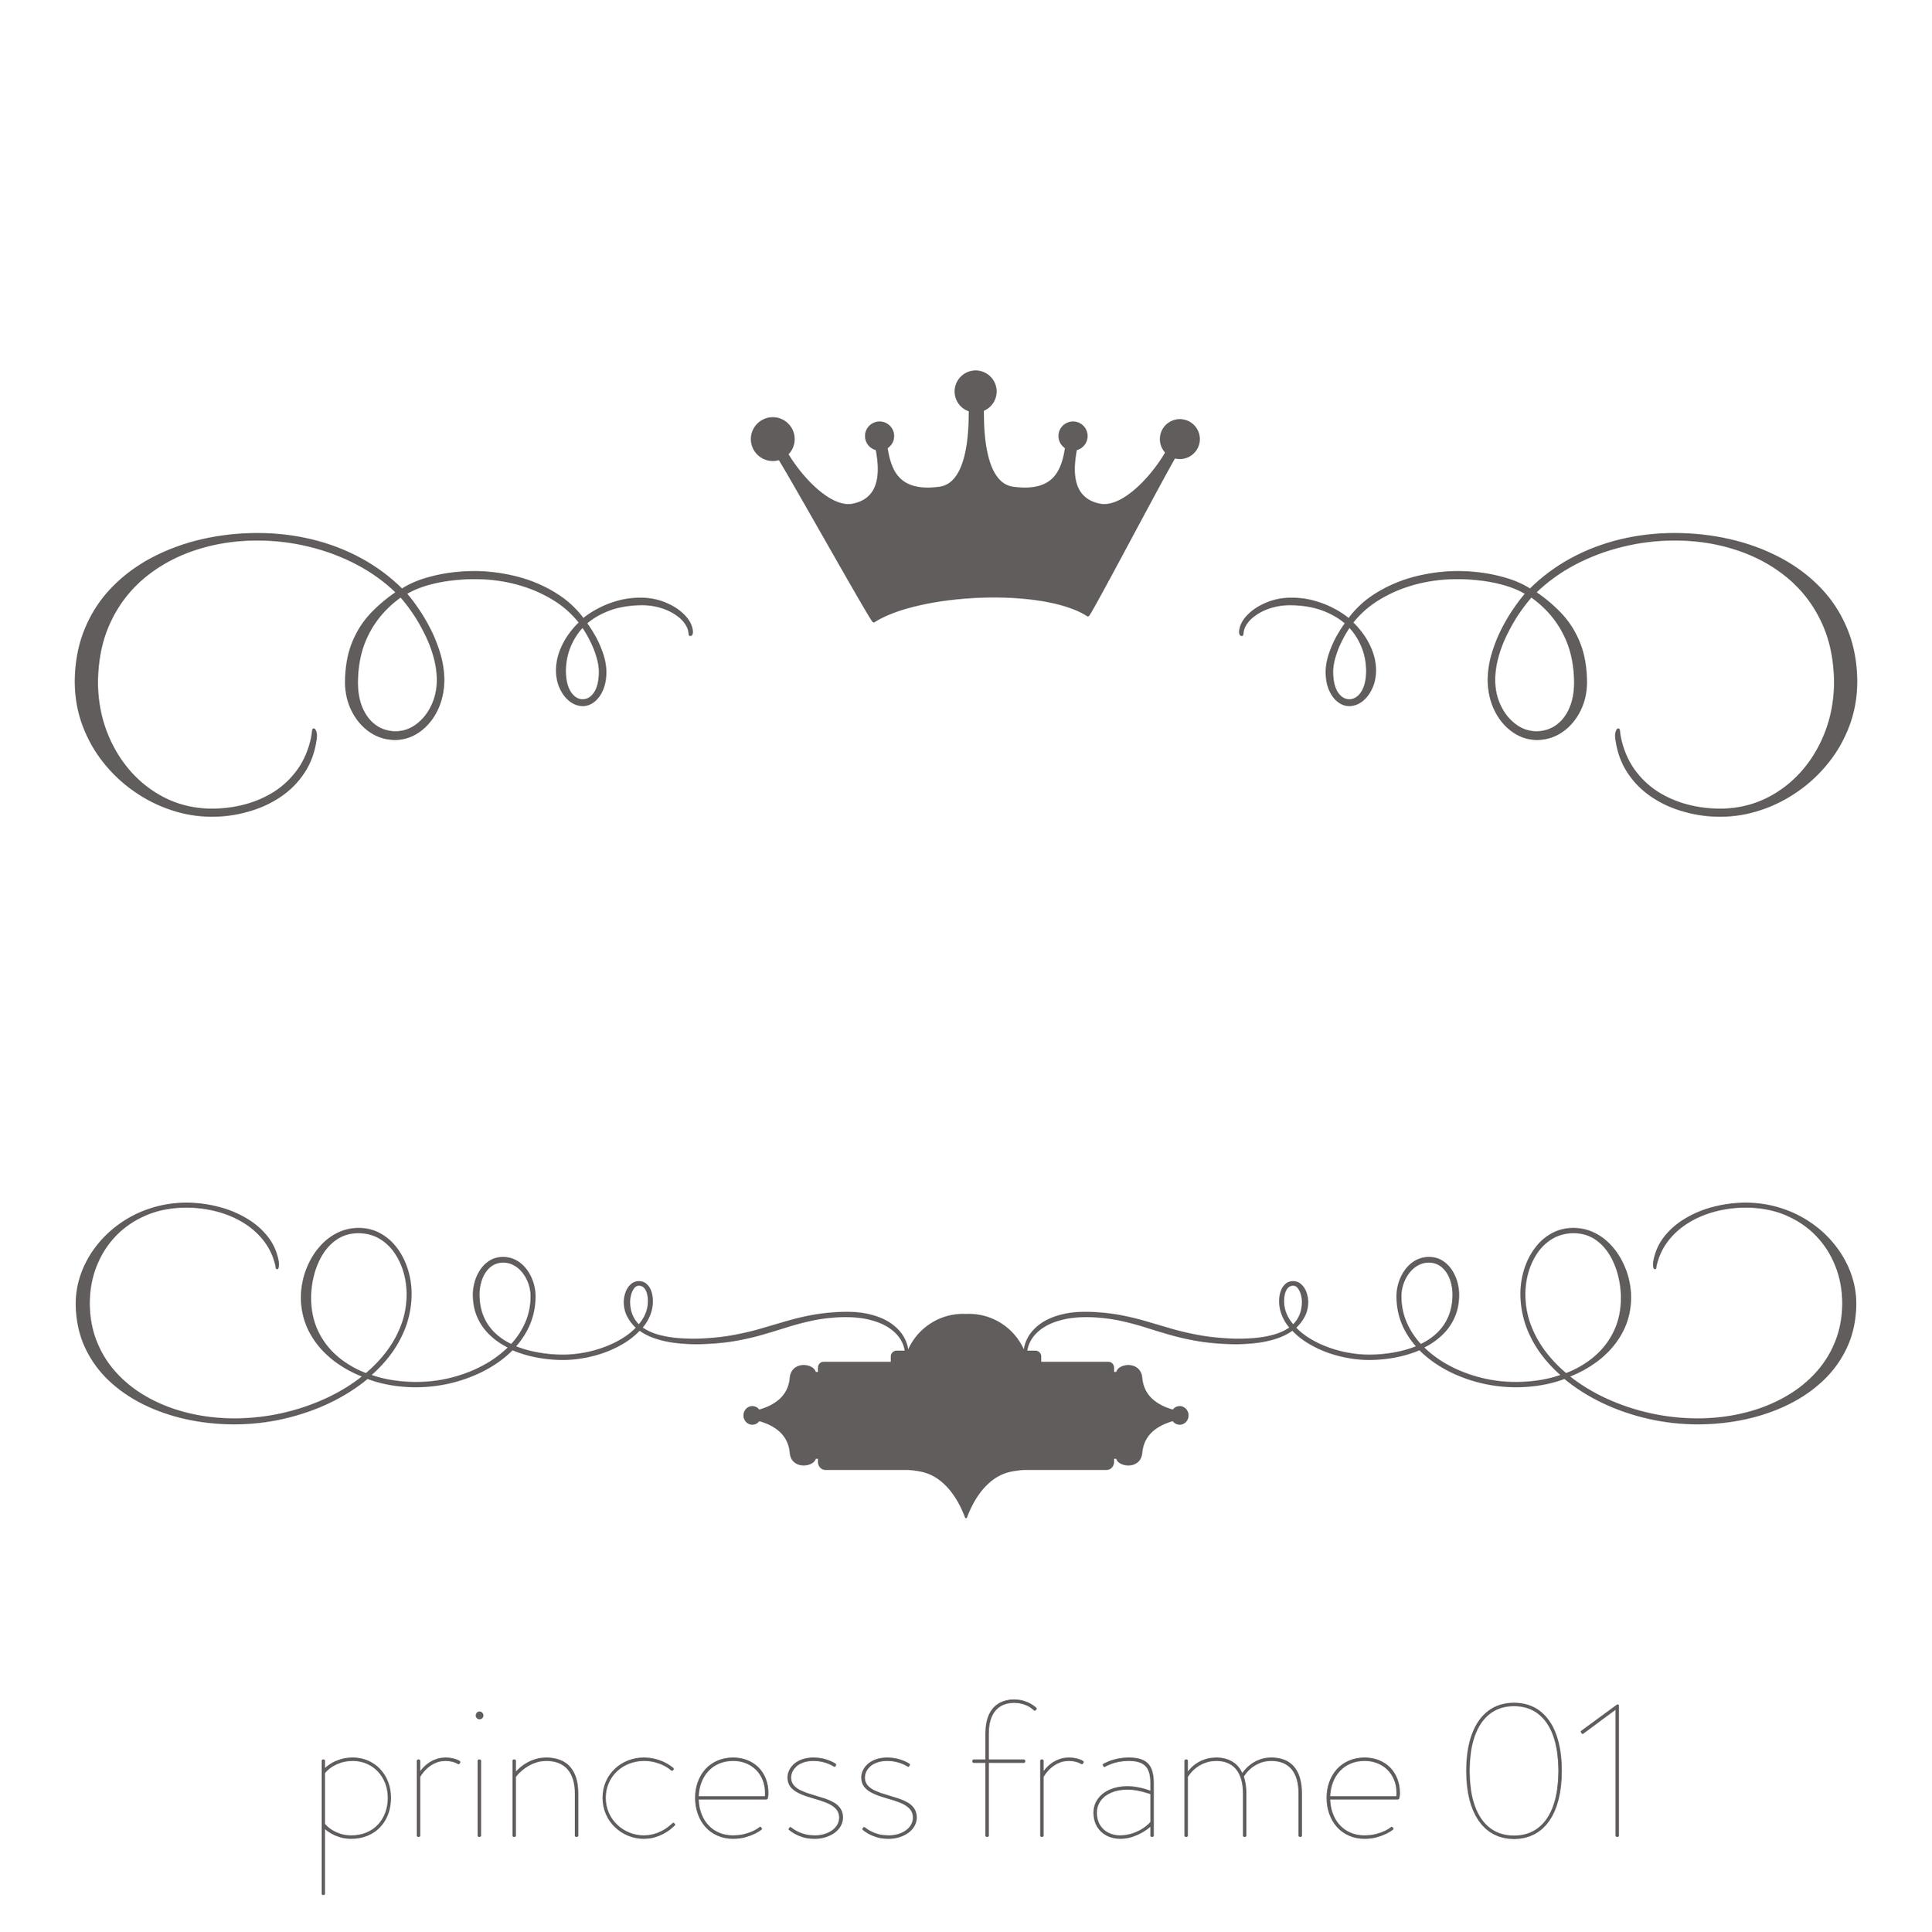 princess frame 01.png